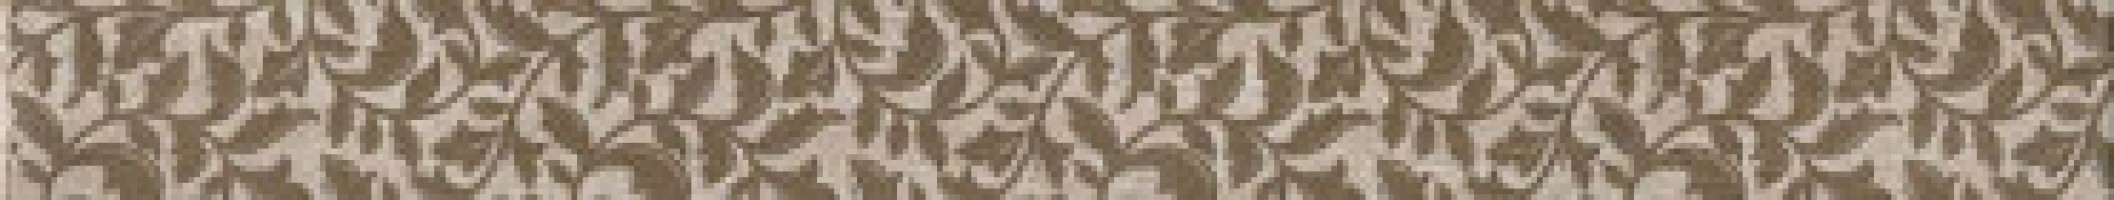 Бордюр Акация беж лапп. DT/A98/SG4128L 50.2x4.9 Kerama Marazzi